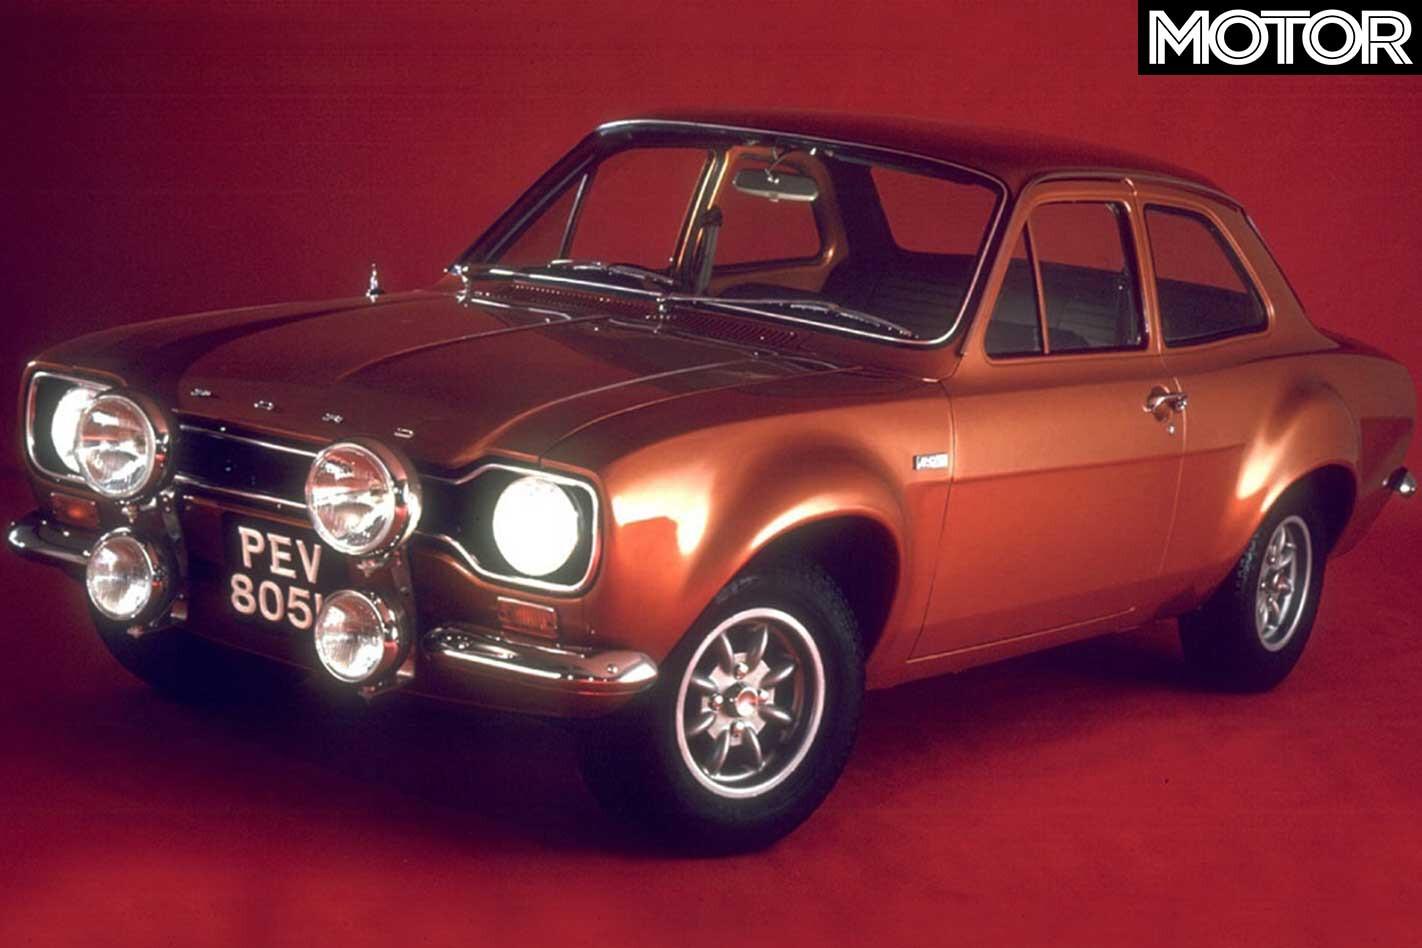 1970 Ford Escort Rs 1600 Jpg